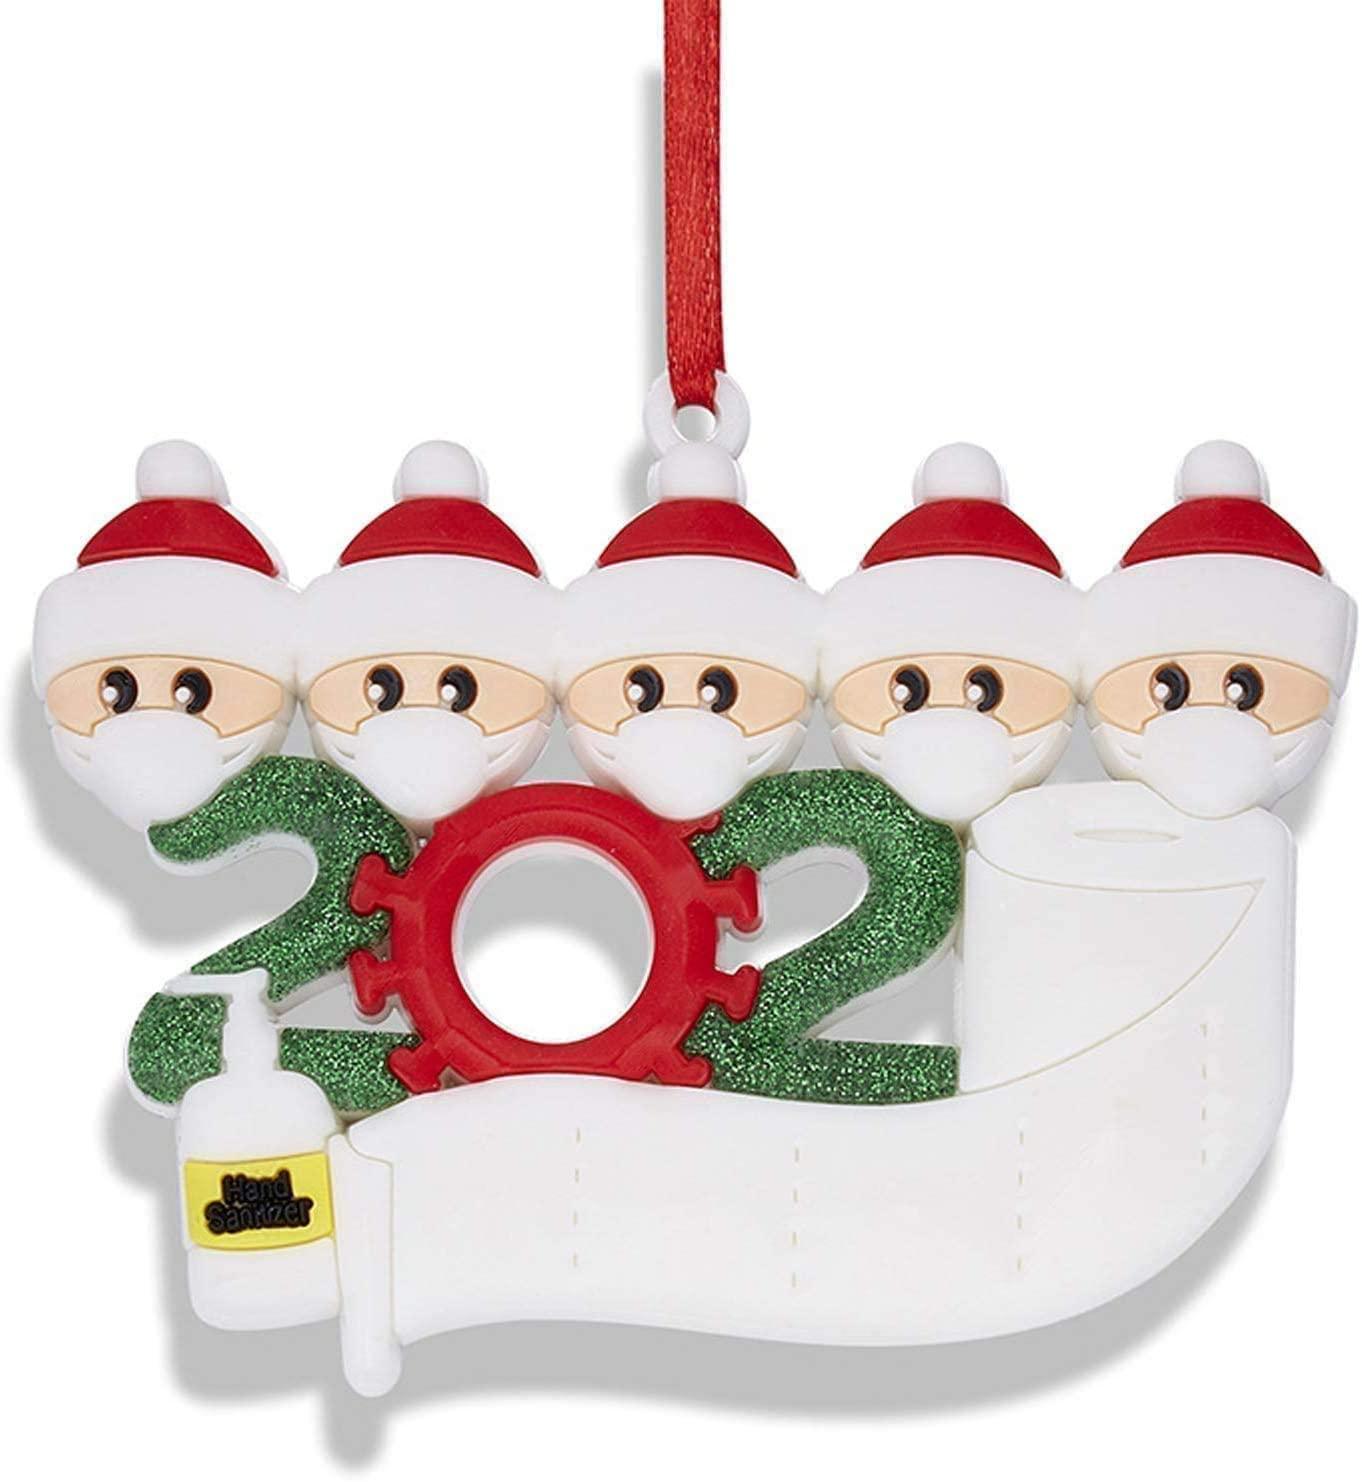 Pure Compression 2020 Christmas Tree Ornaments, Christmas Ornaments Family of 2-7, DIY Christmas Decorations with Custom Name Christmas Tree Hanging Home Decorations (2PCS, Family of 5)